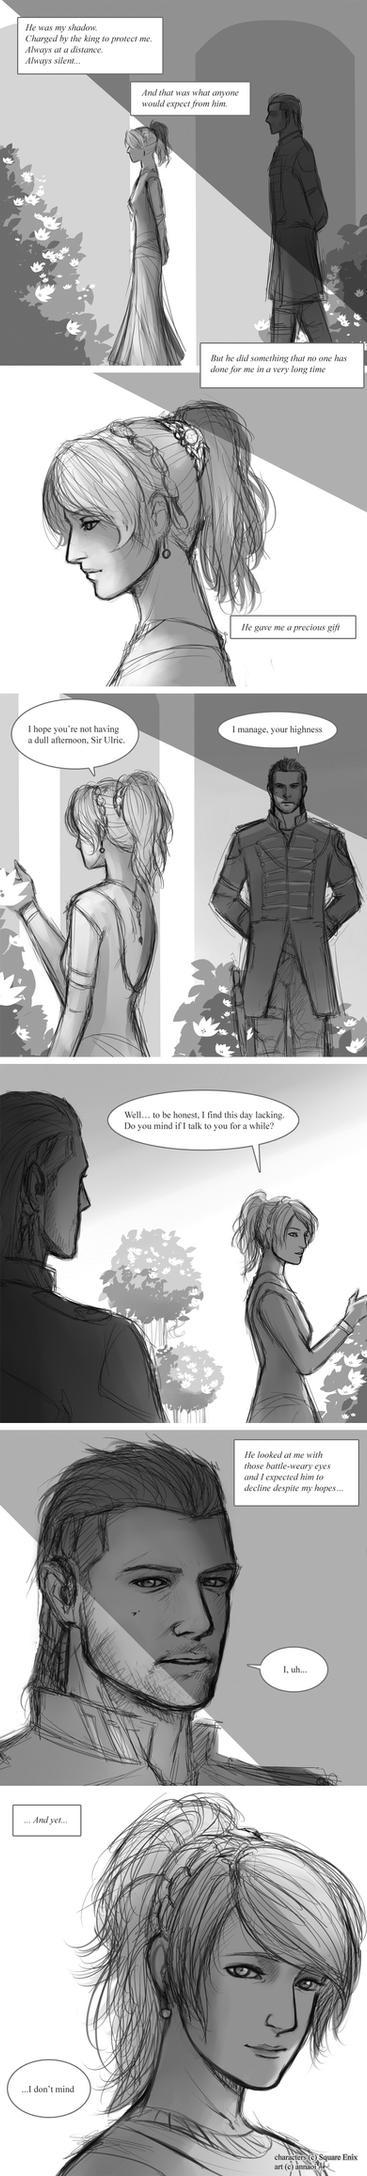 Shadows in the Garden - Part 1 by annaoi